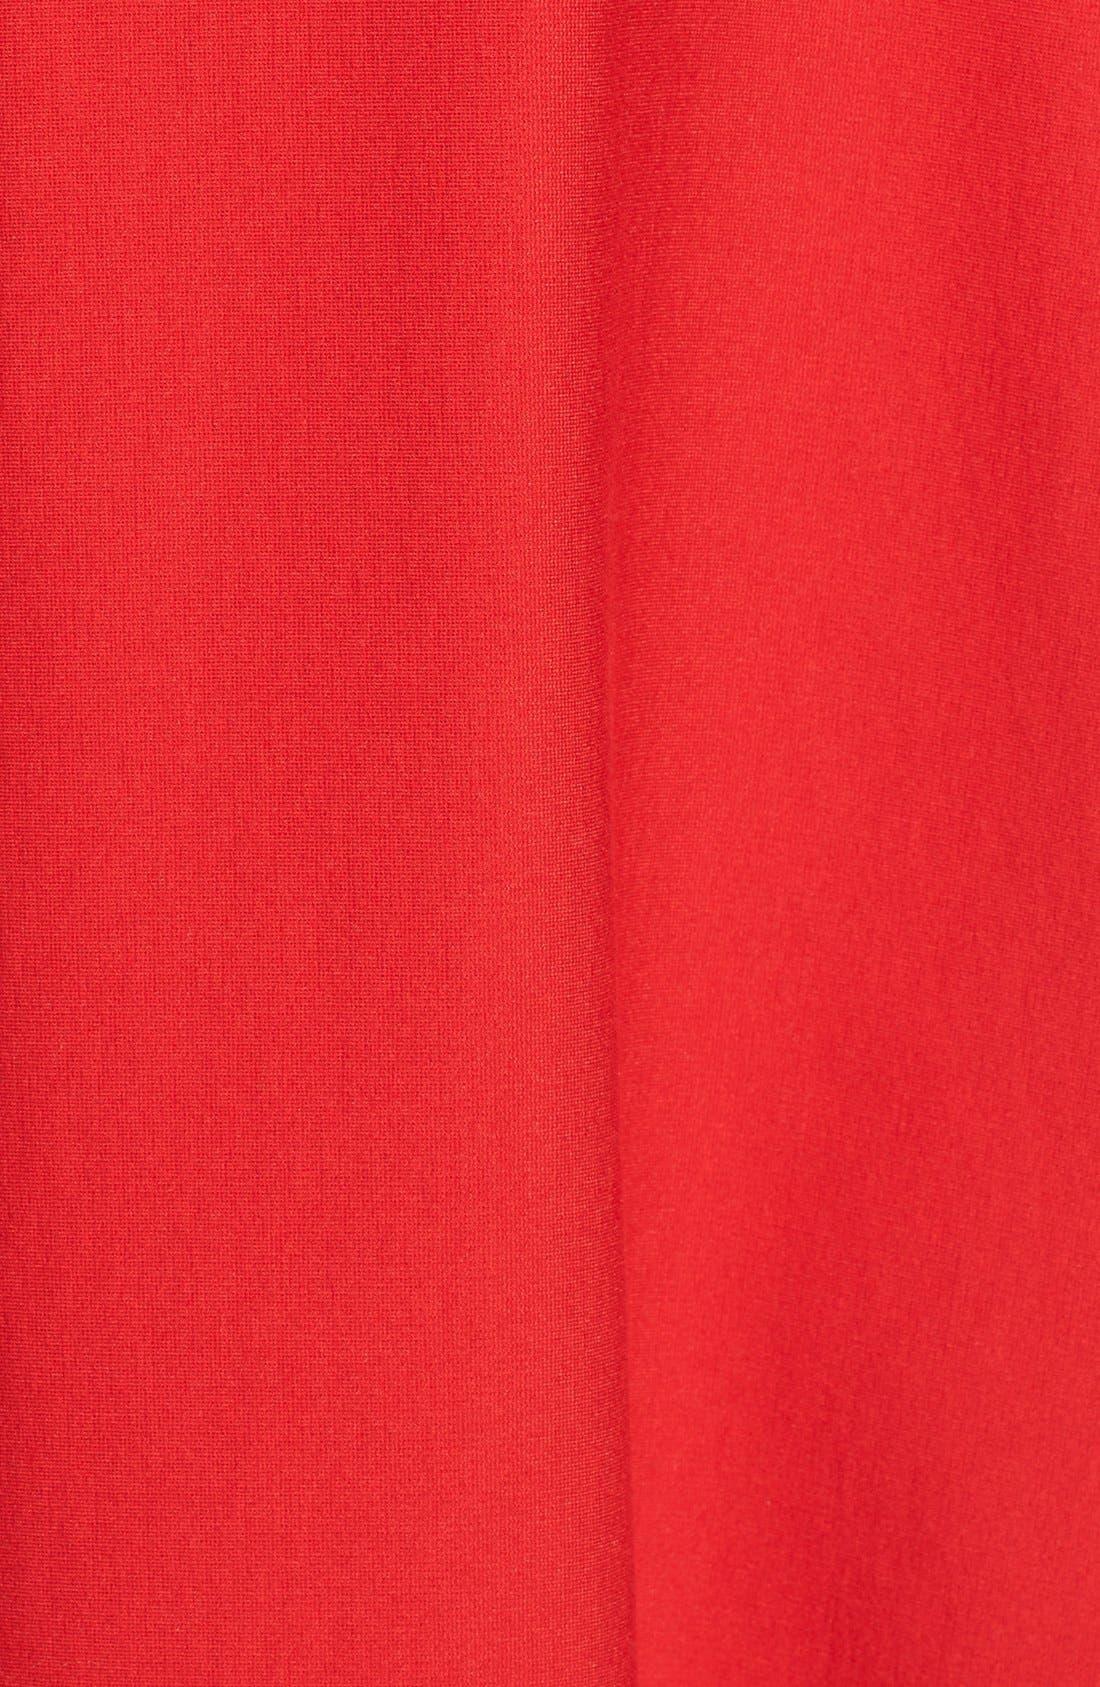 Alternate Image 3  - kate spade new york 'jada' stretch fit & flare dress